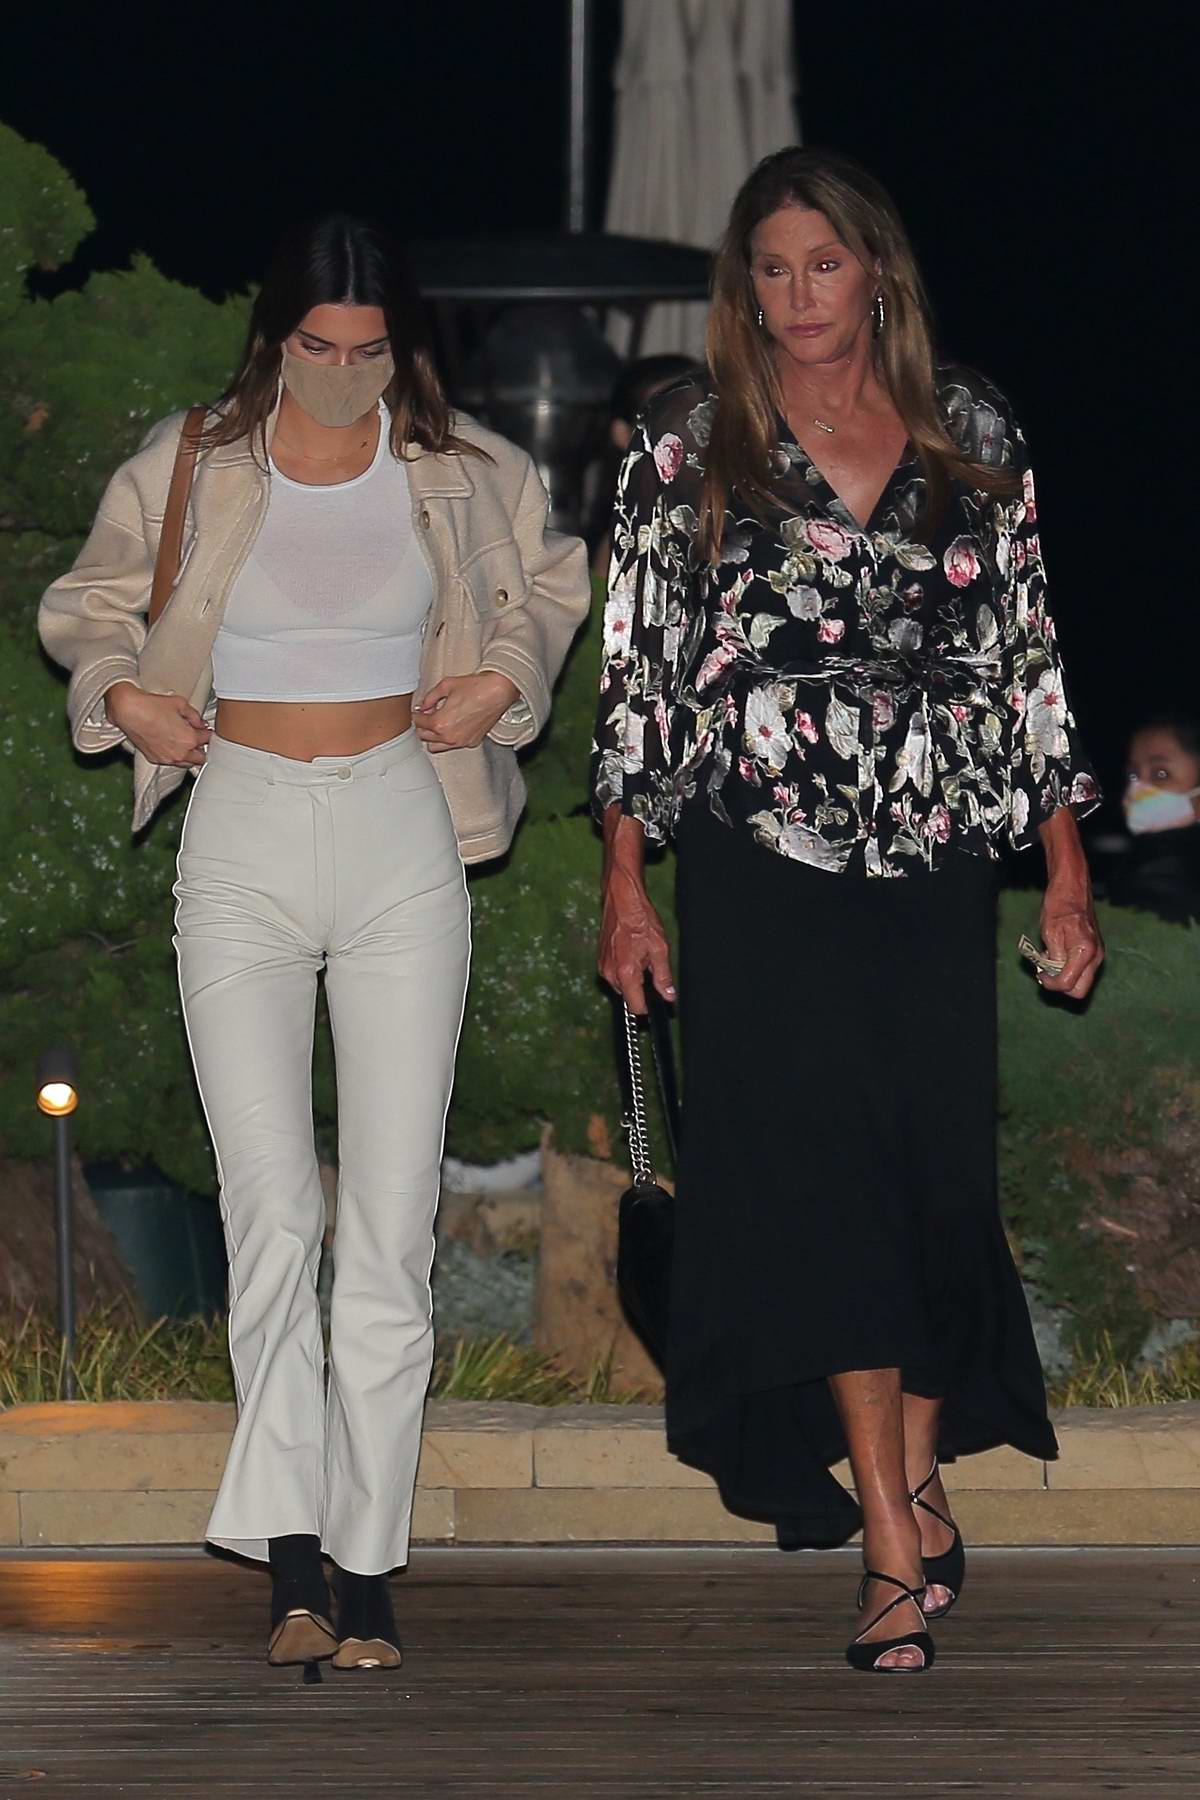 Kendall Jenner and Caitlyn Jenner enjoy dinner at Nobu in Malibu, California